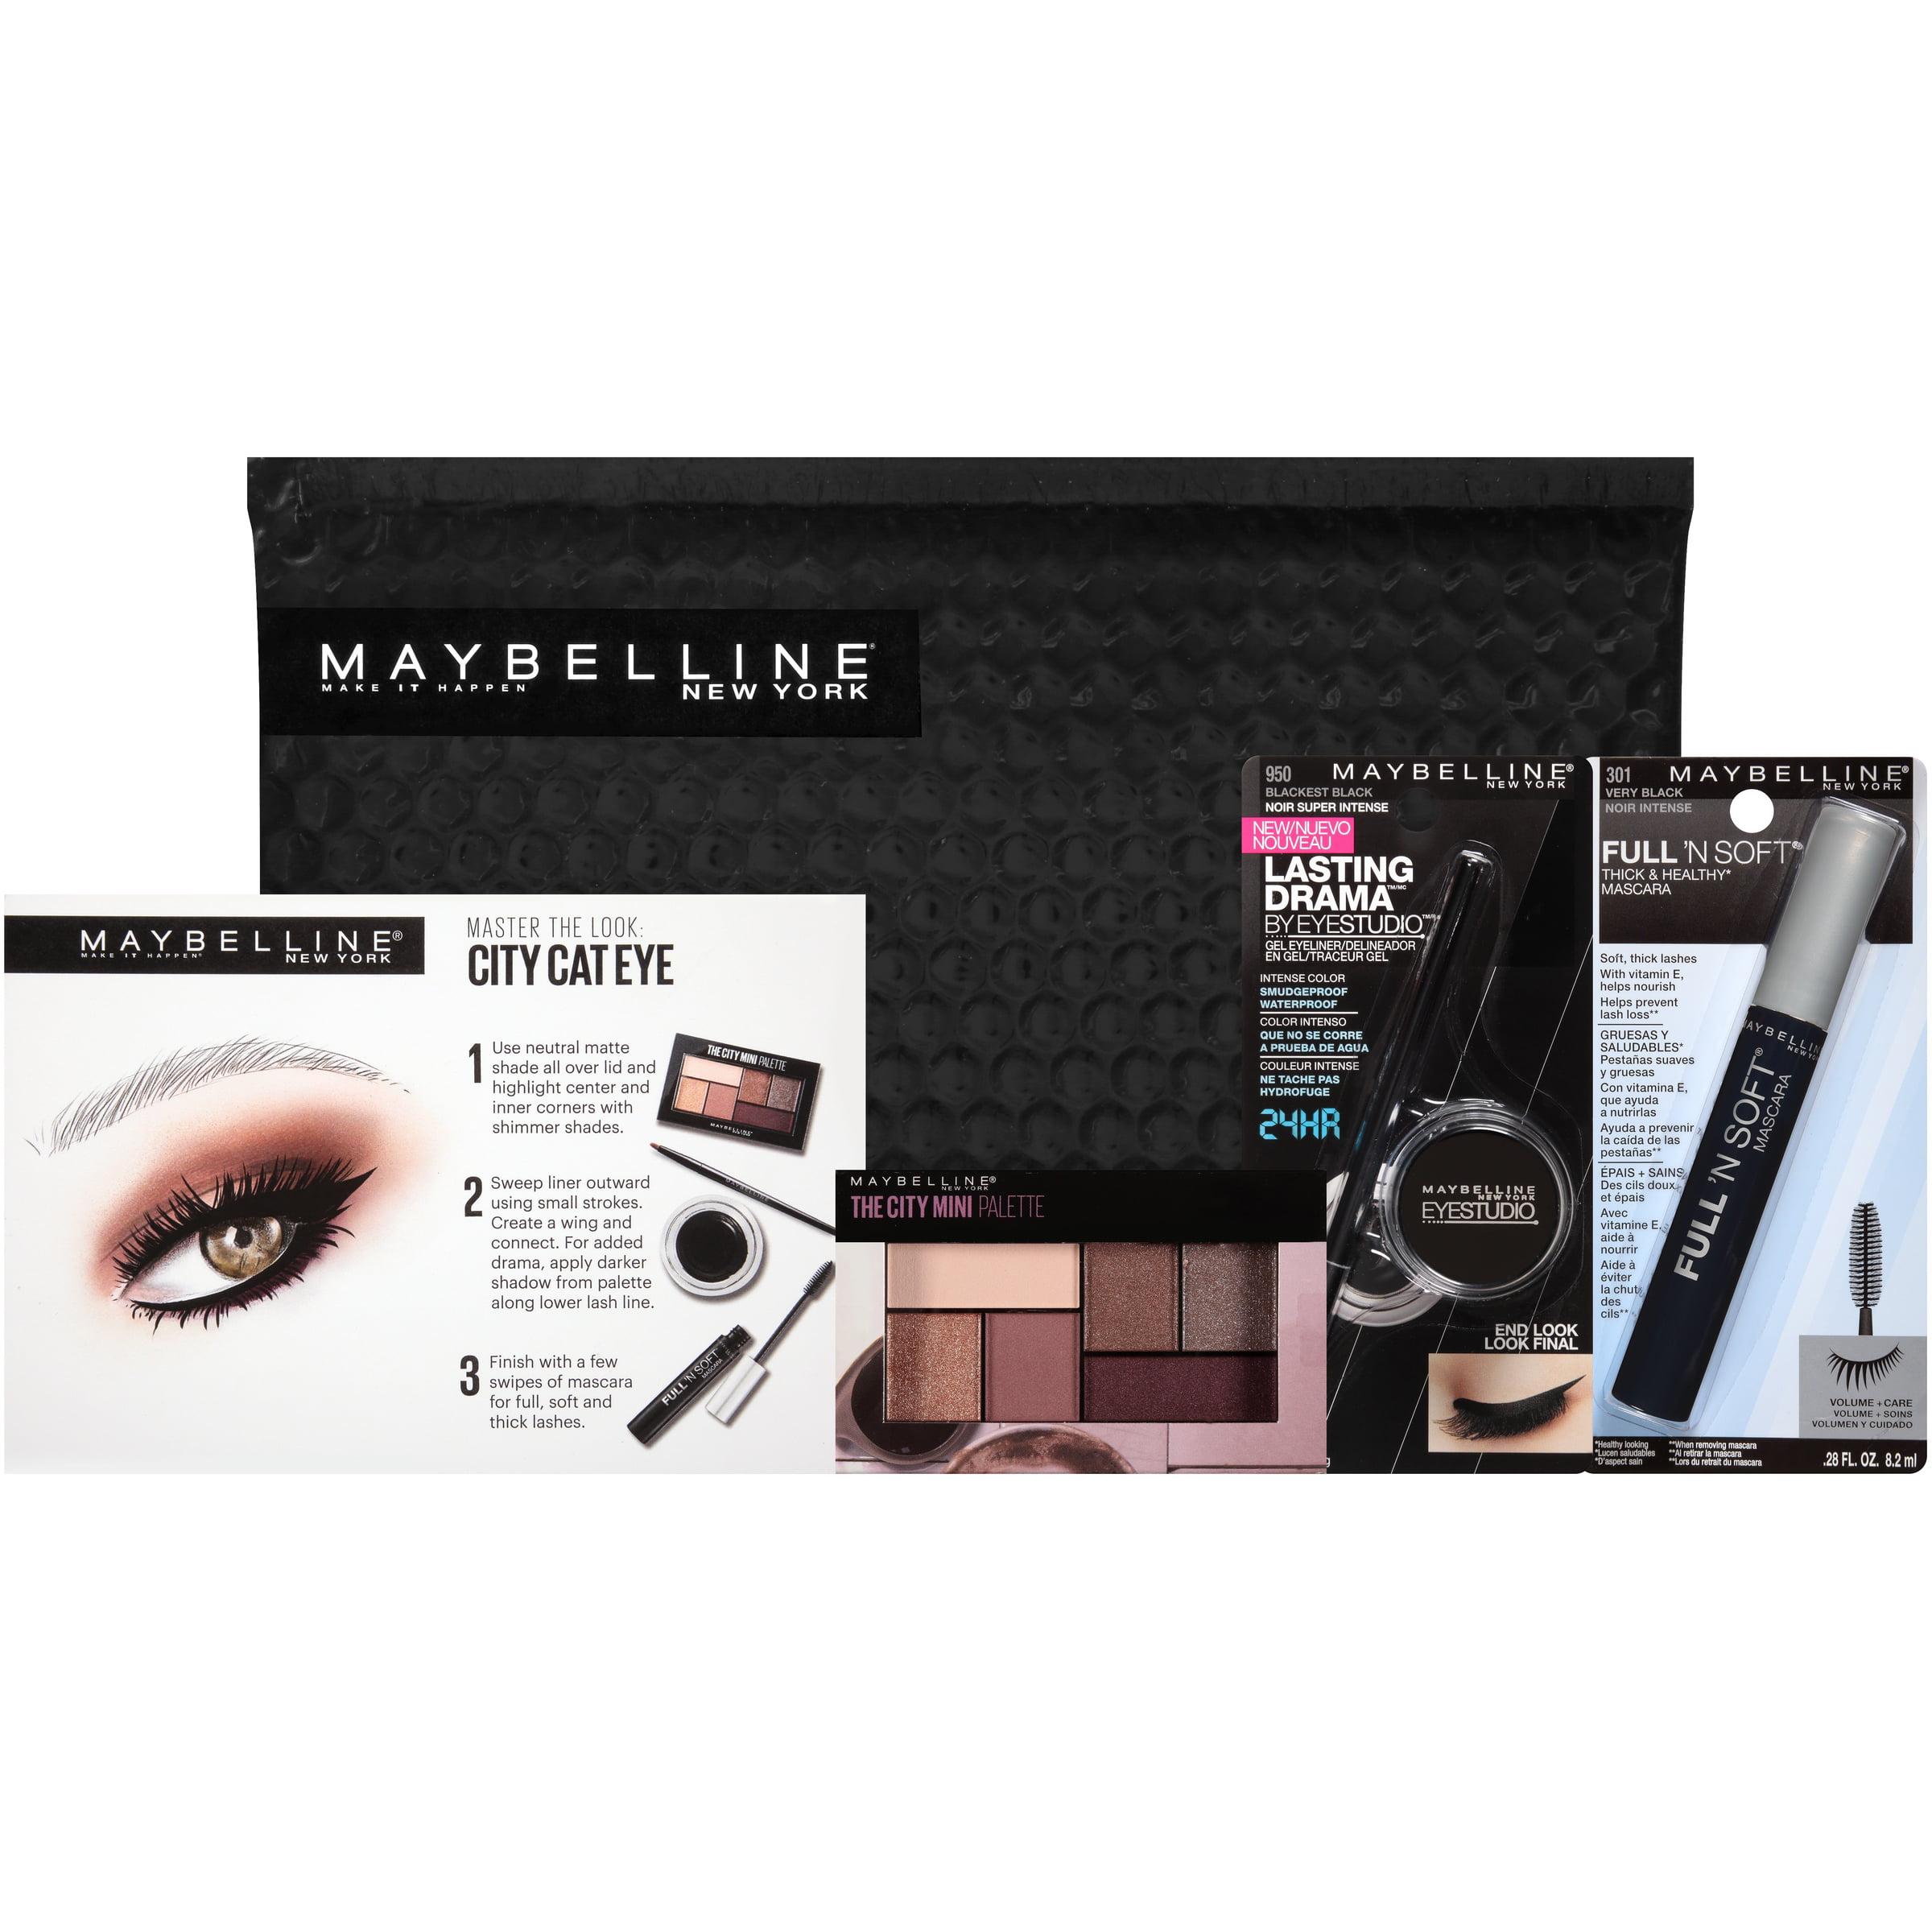 Maybelline New York Eye Makeup Kit 3 pc